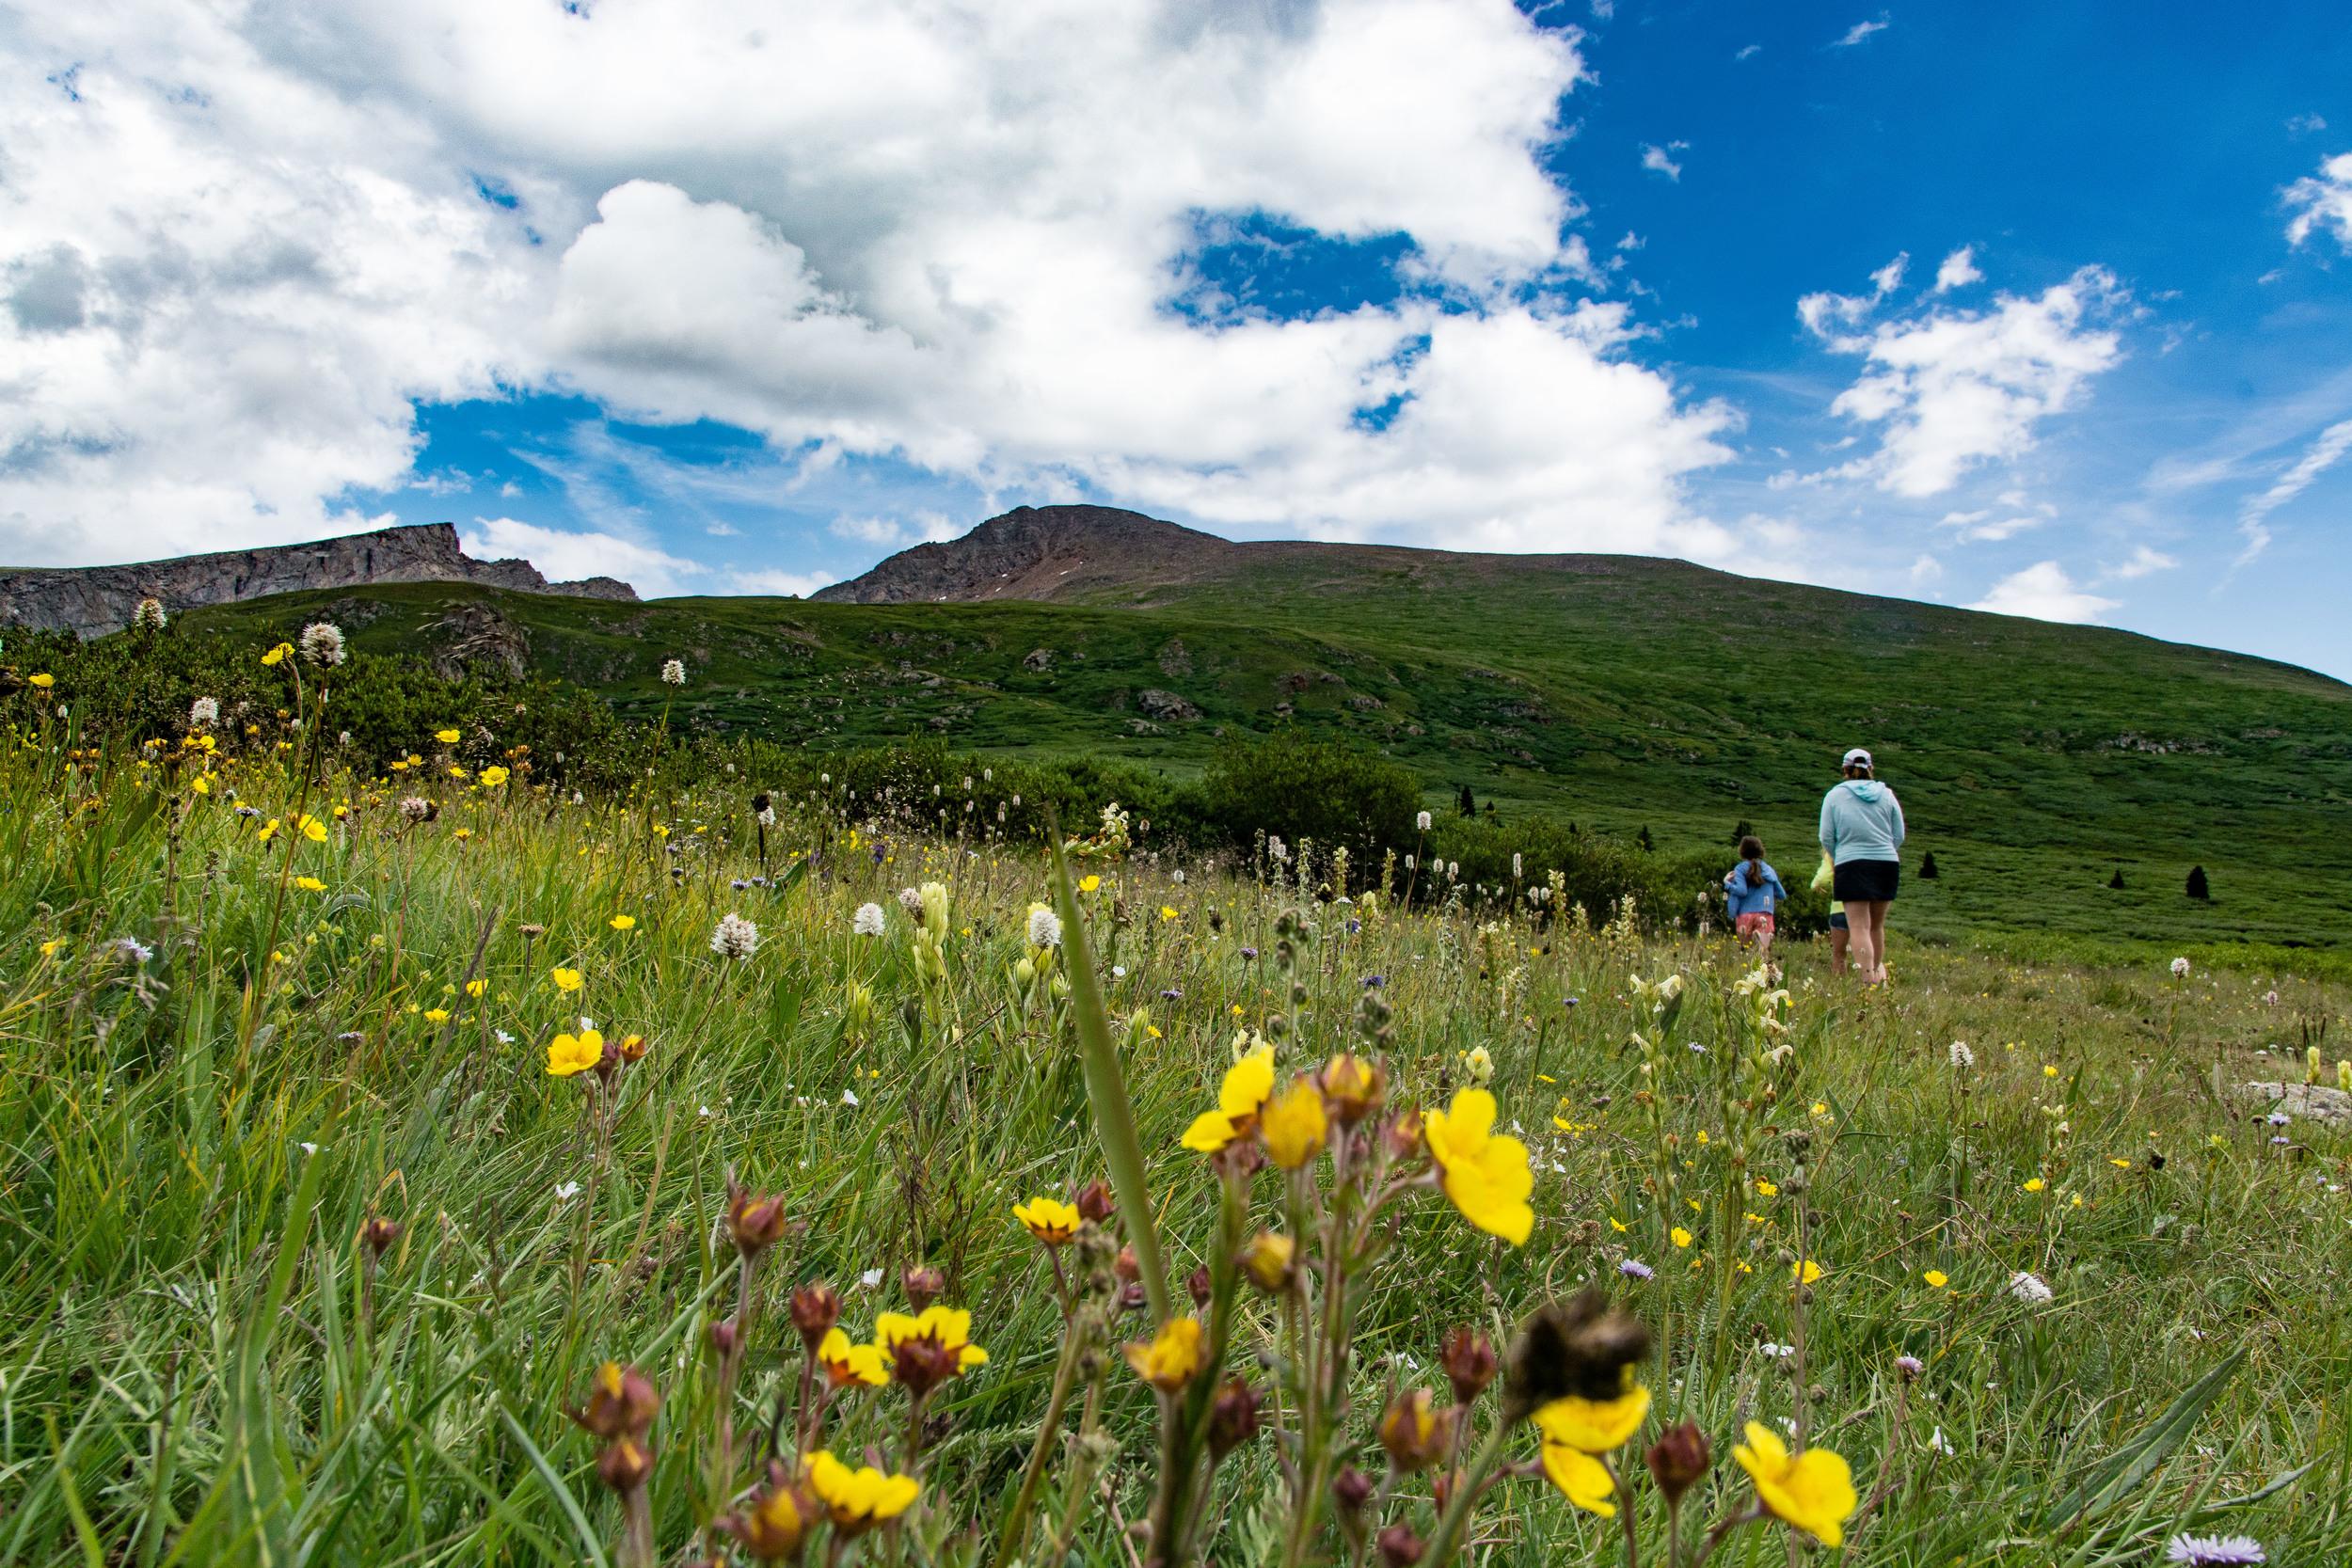 Hearty Alpine wildflowers EVERYWHERE!